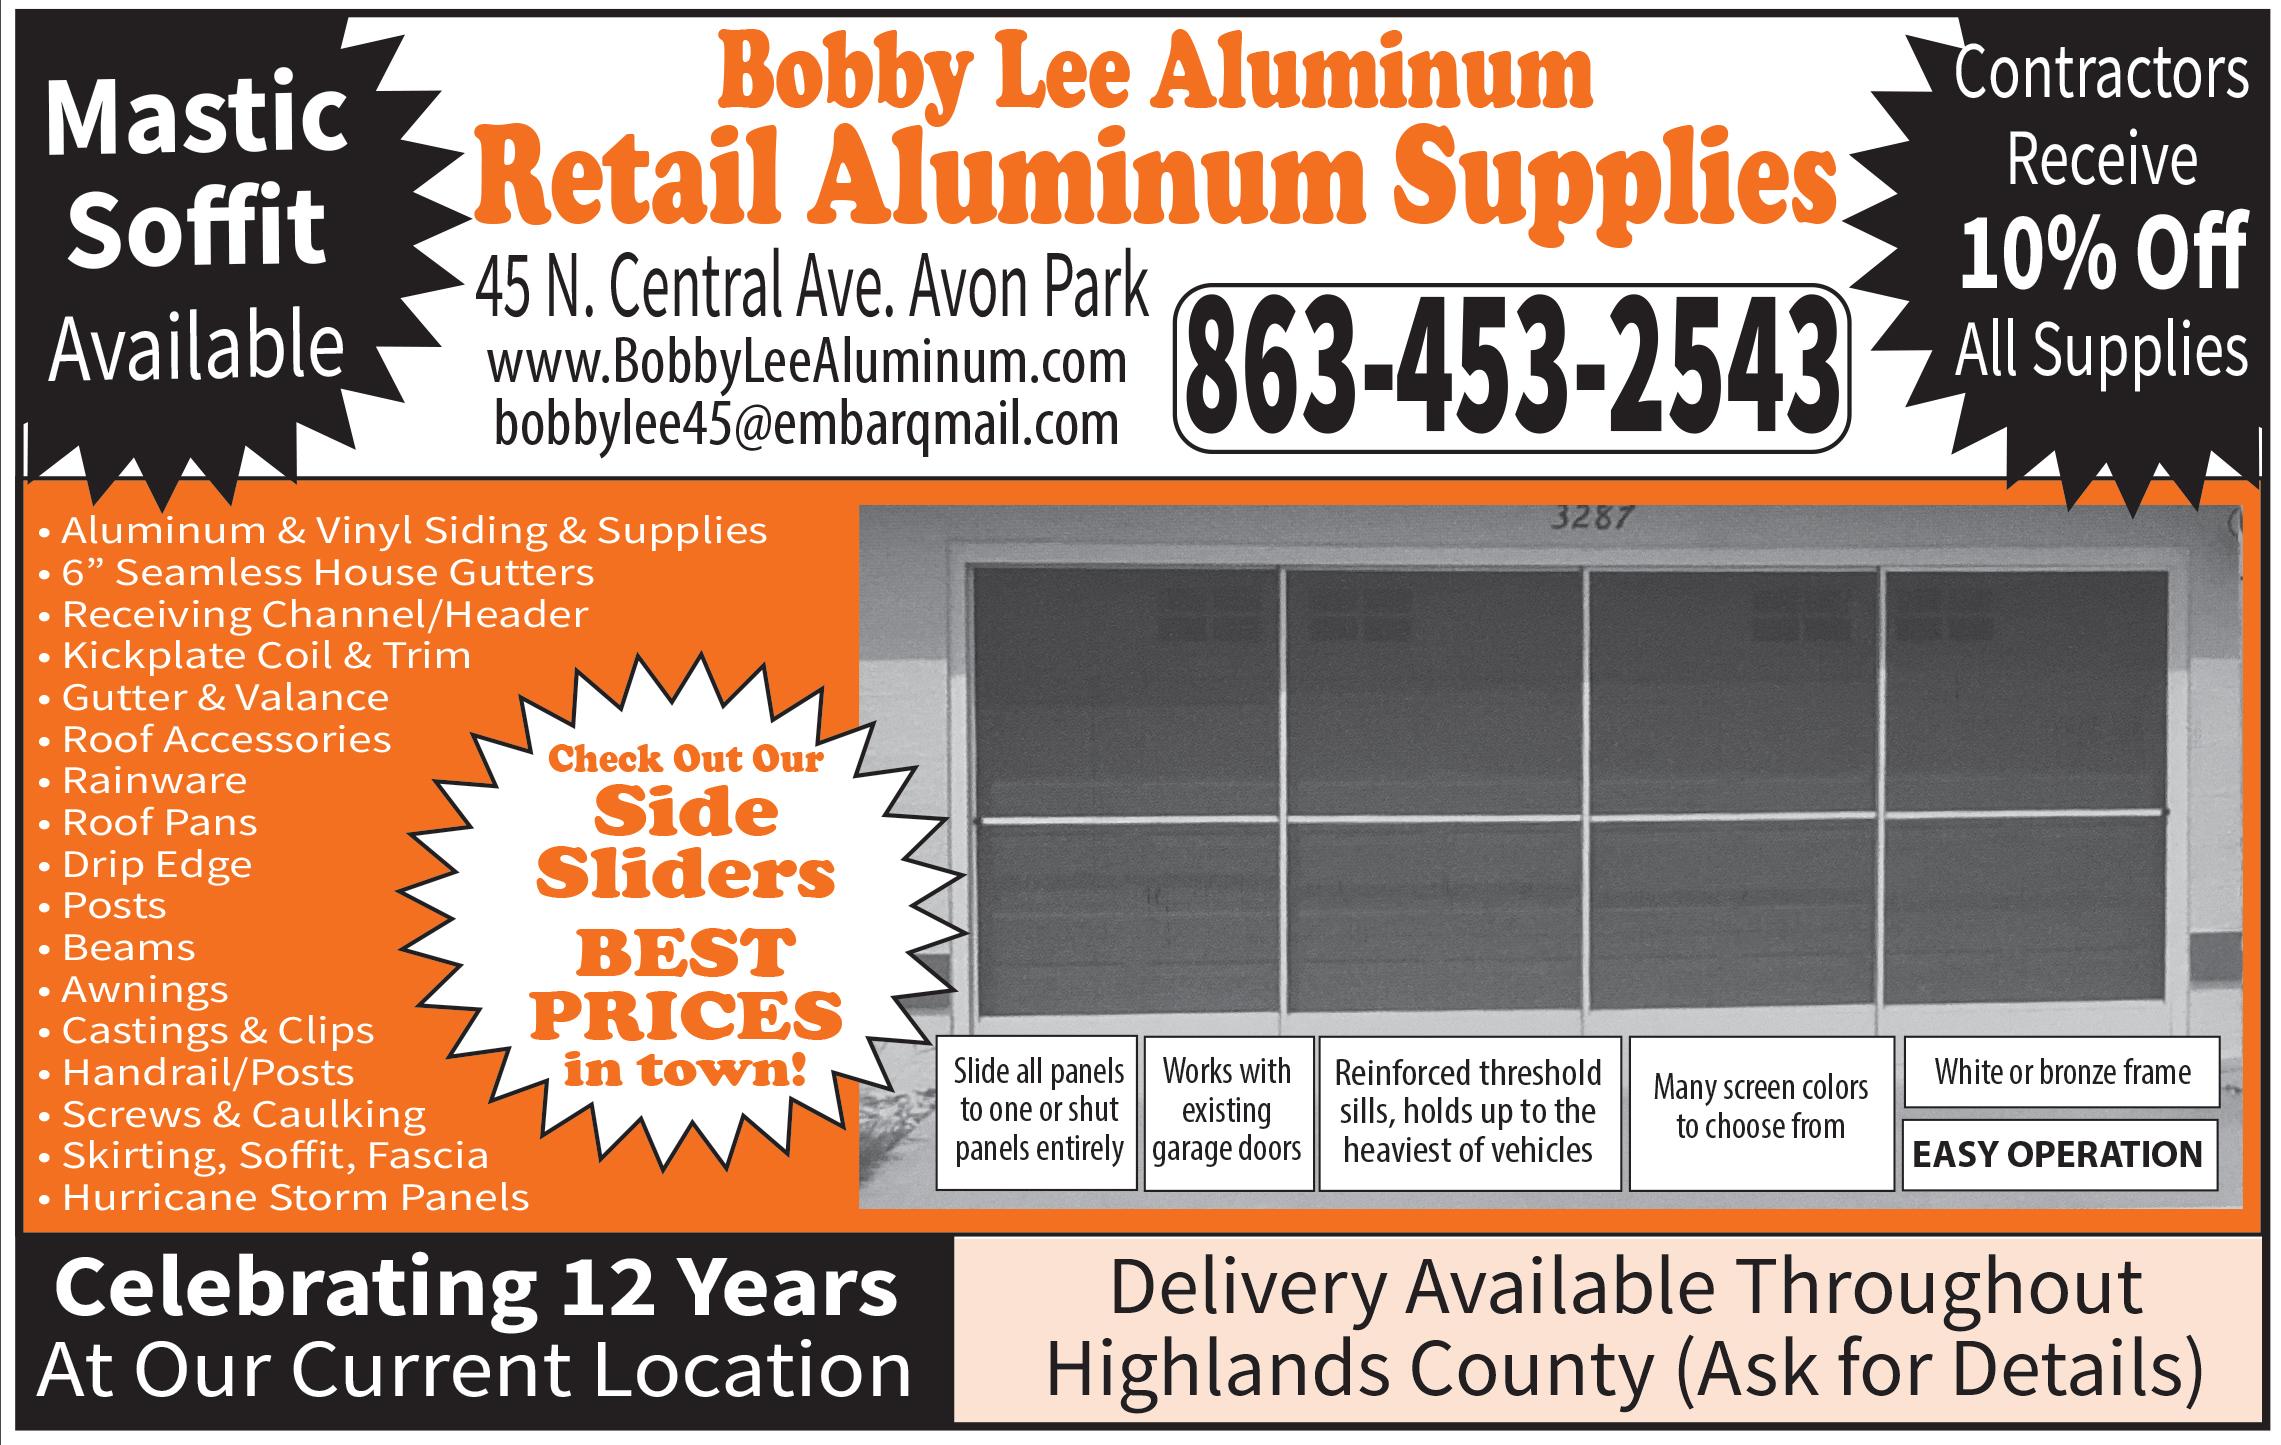 Bobby-Lee-Aluminum-Contractors